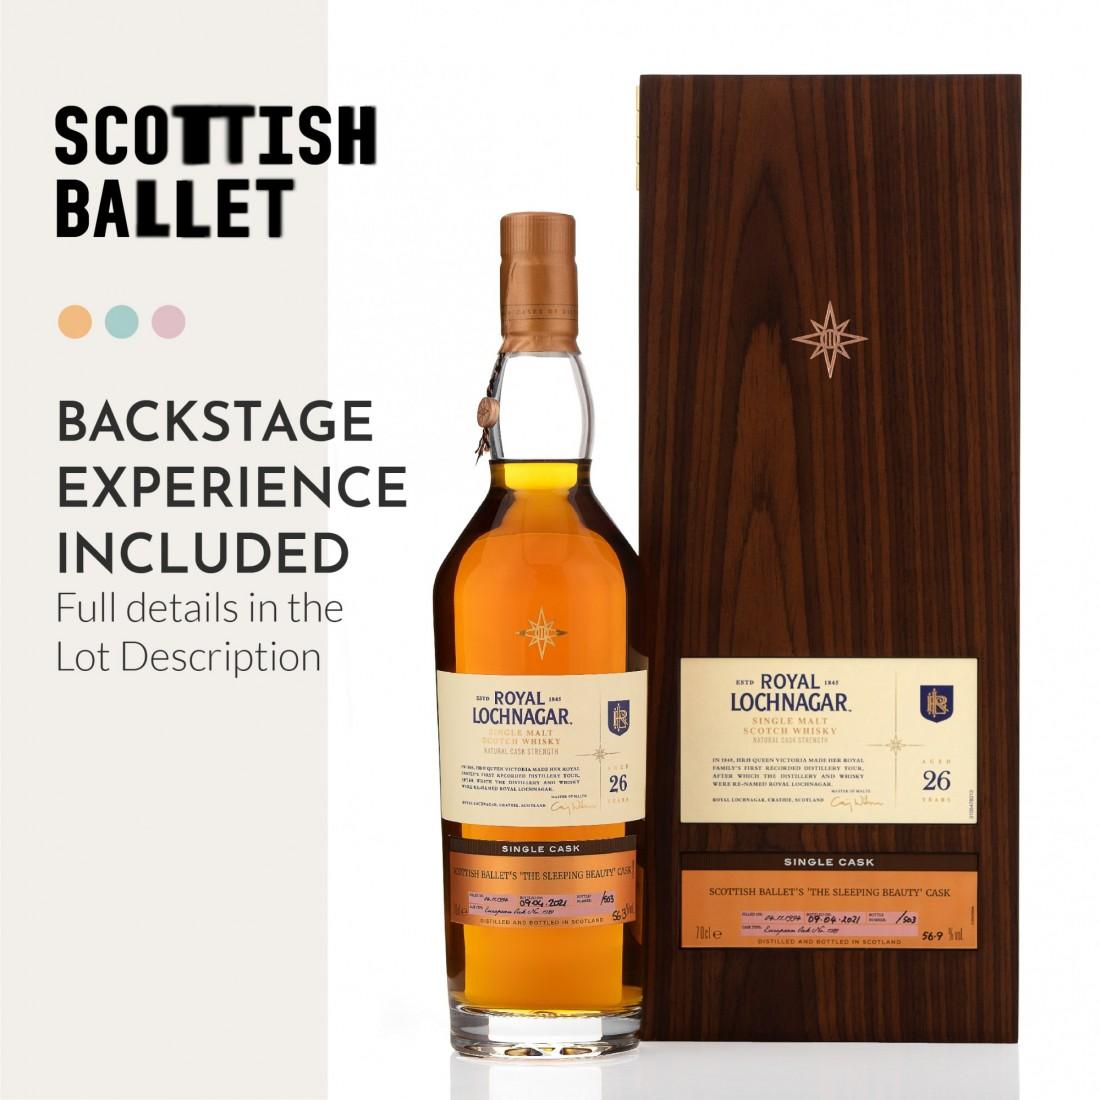 Royal Lochnagar 1994 Casks of Distinction 26 Year Old #1289 / Bottle #005